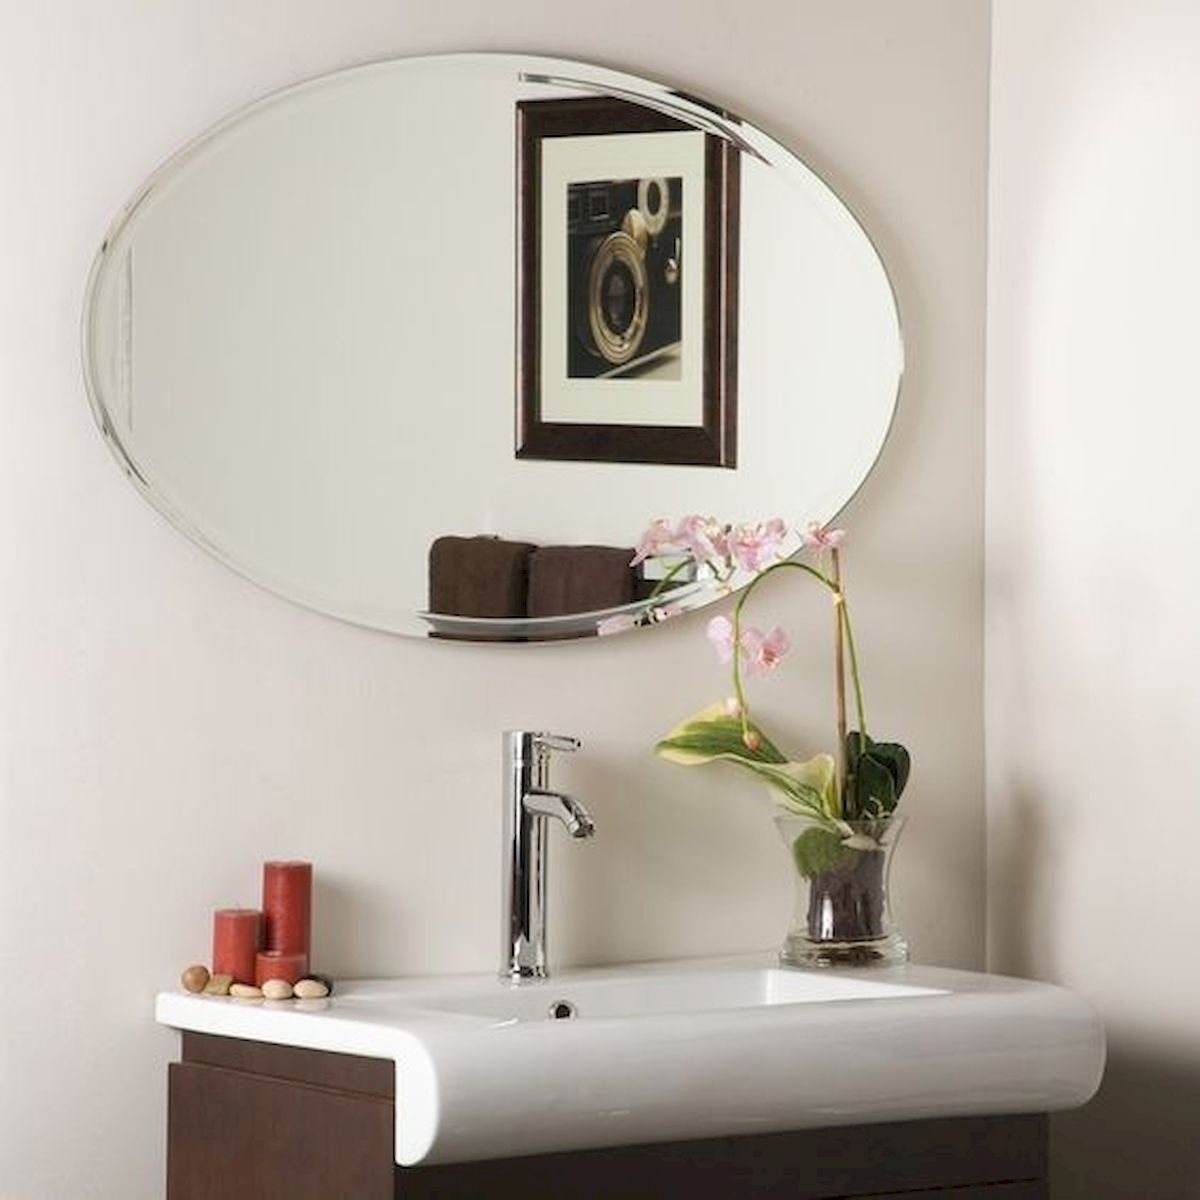 26 Easy and Creative DIY Mirror Ideas To Decorate Your Bathroom (21)